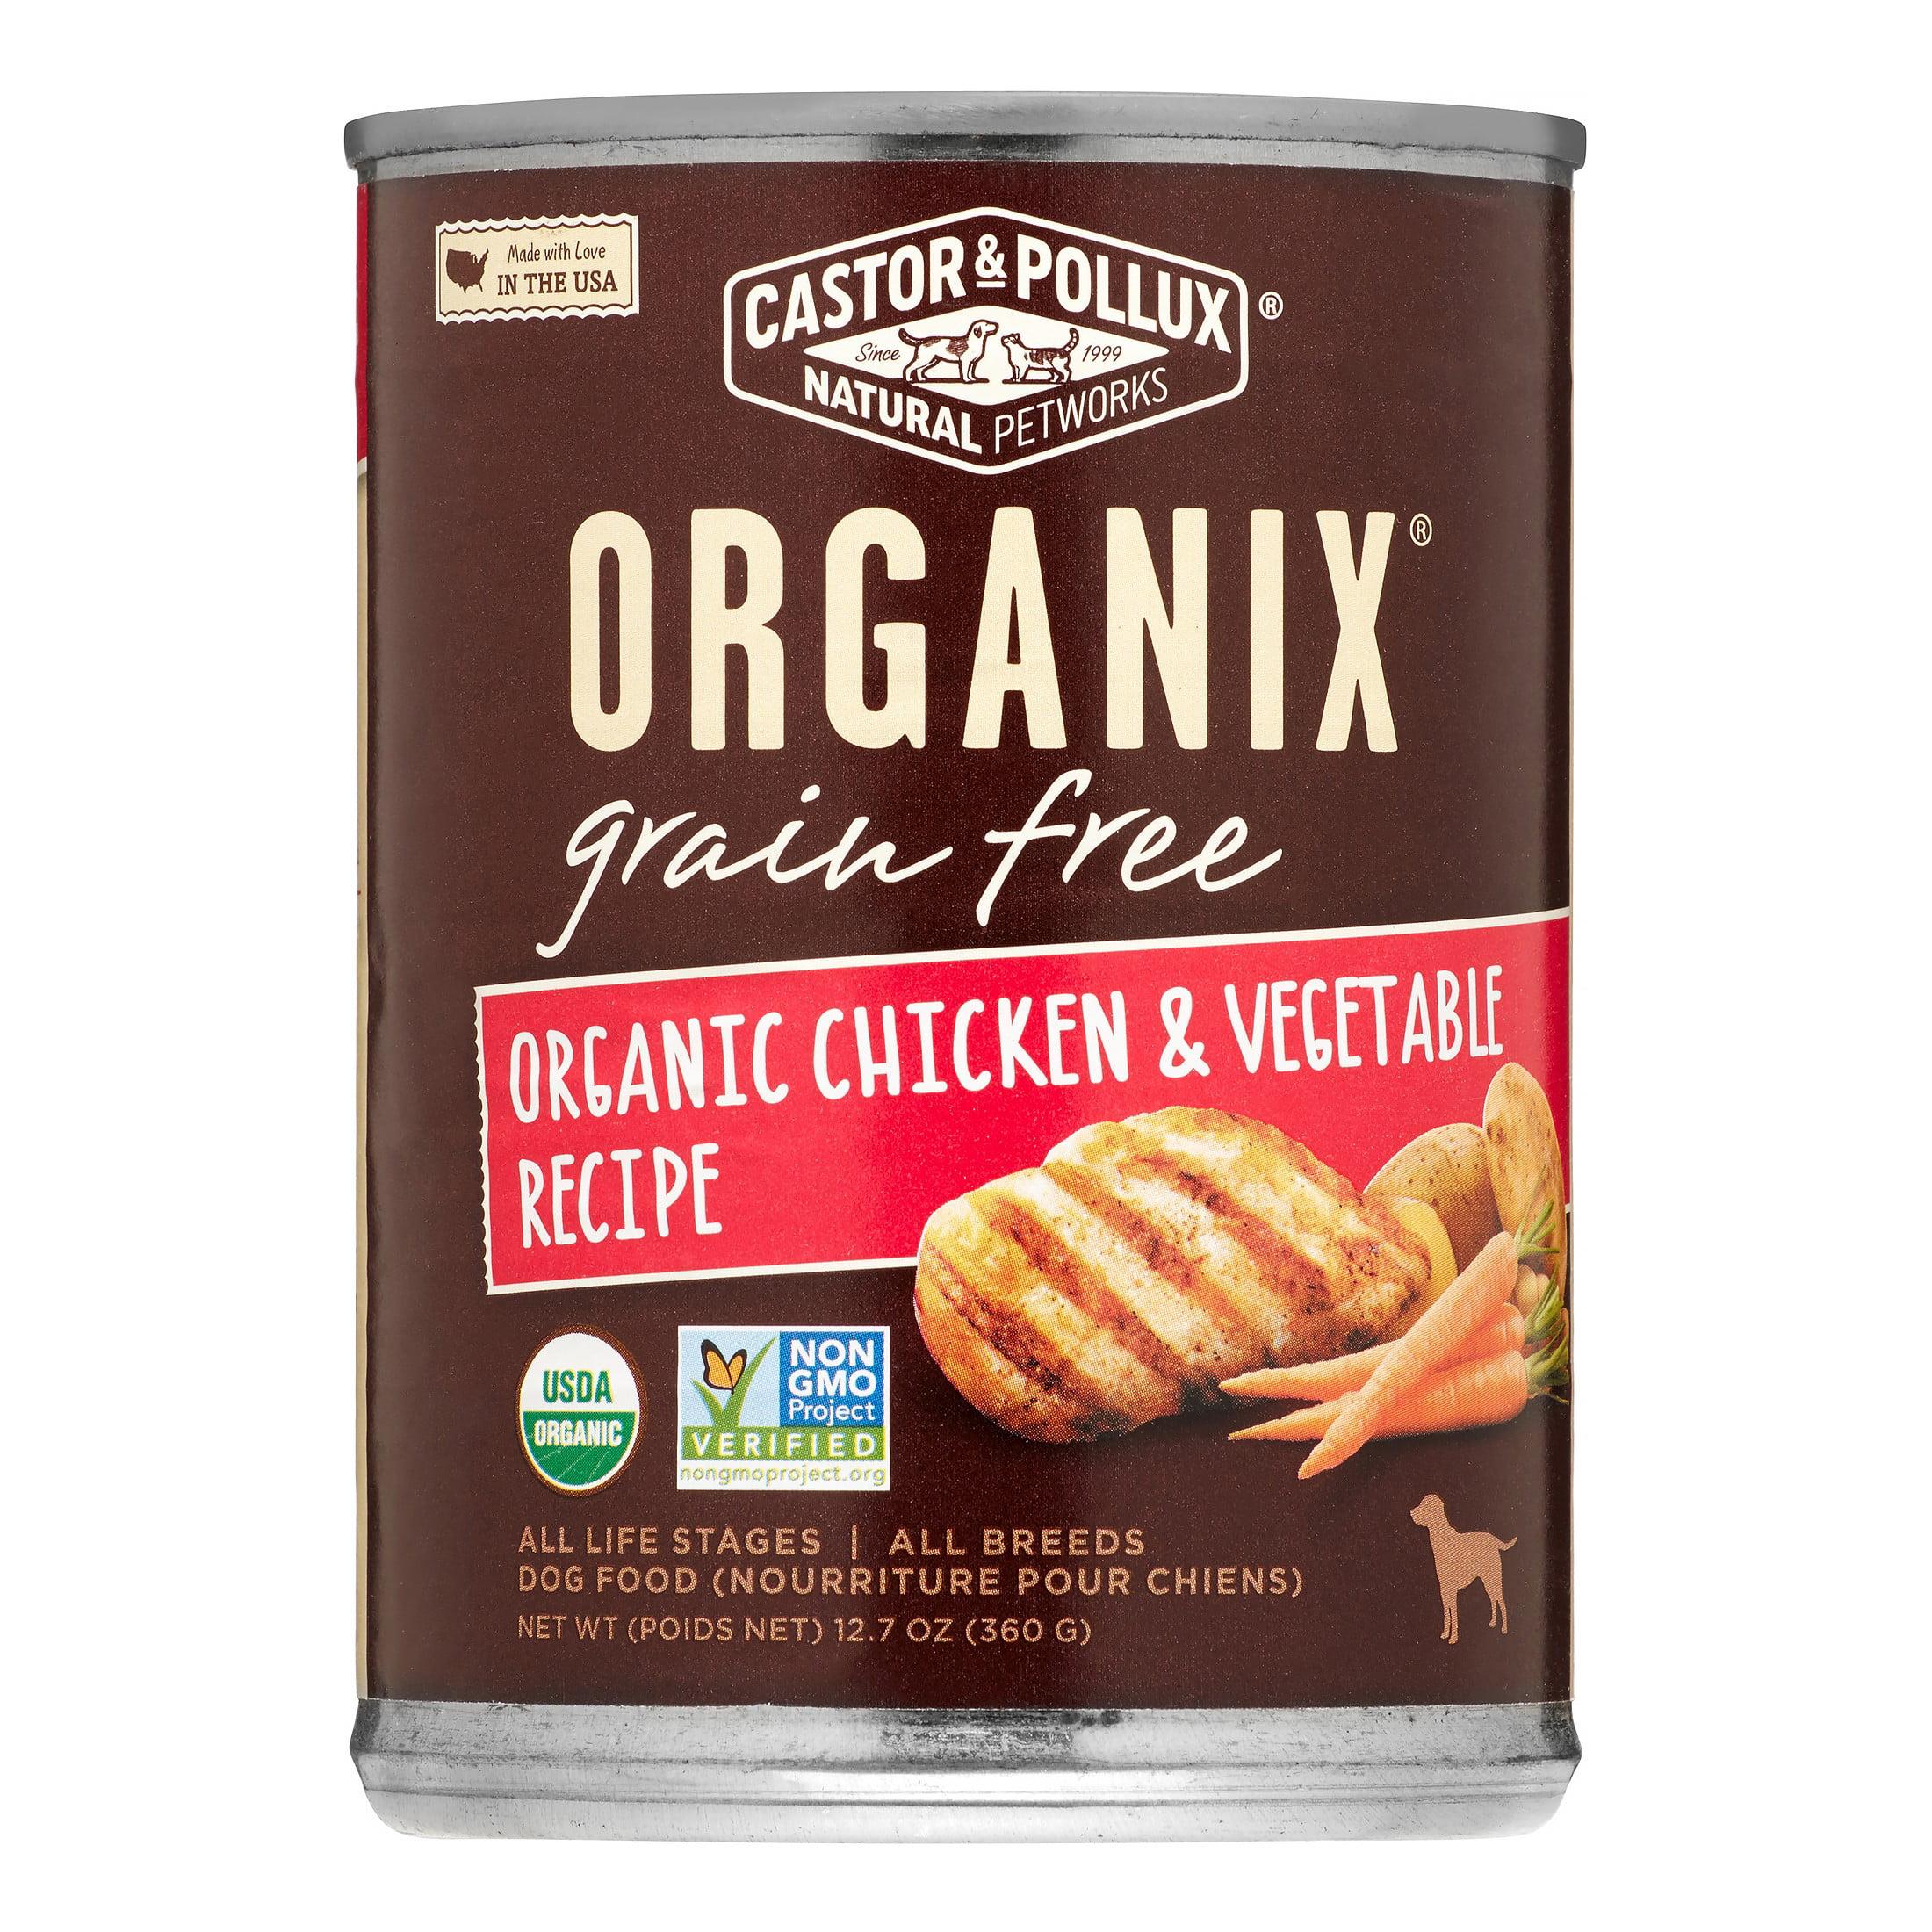 Castor & Pollux Organix Grain-Free Chicken & Vegetable Wet Dog Food, 12.7 oz Case of 12